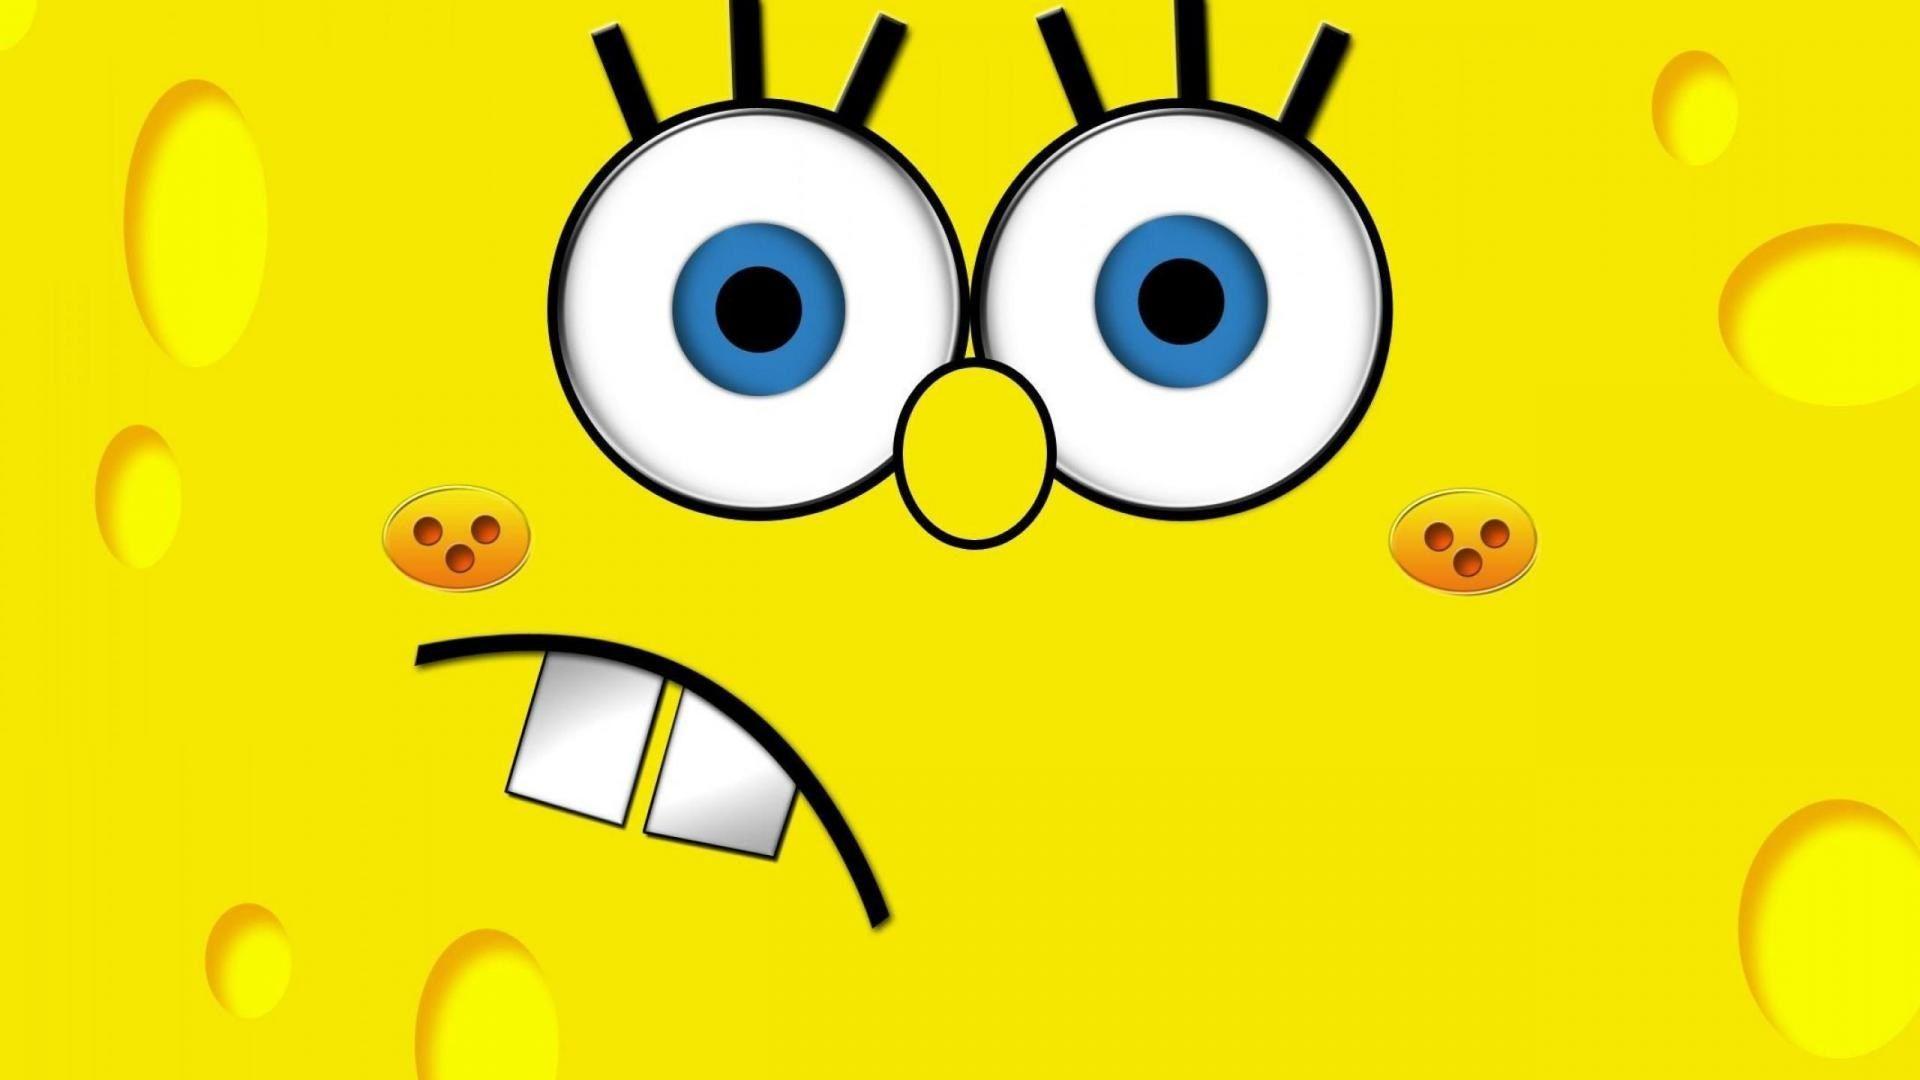 spongebob backgrounds for widescreen, 1920 x 1080 (86 kB)